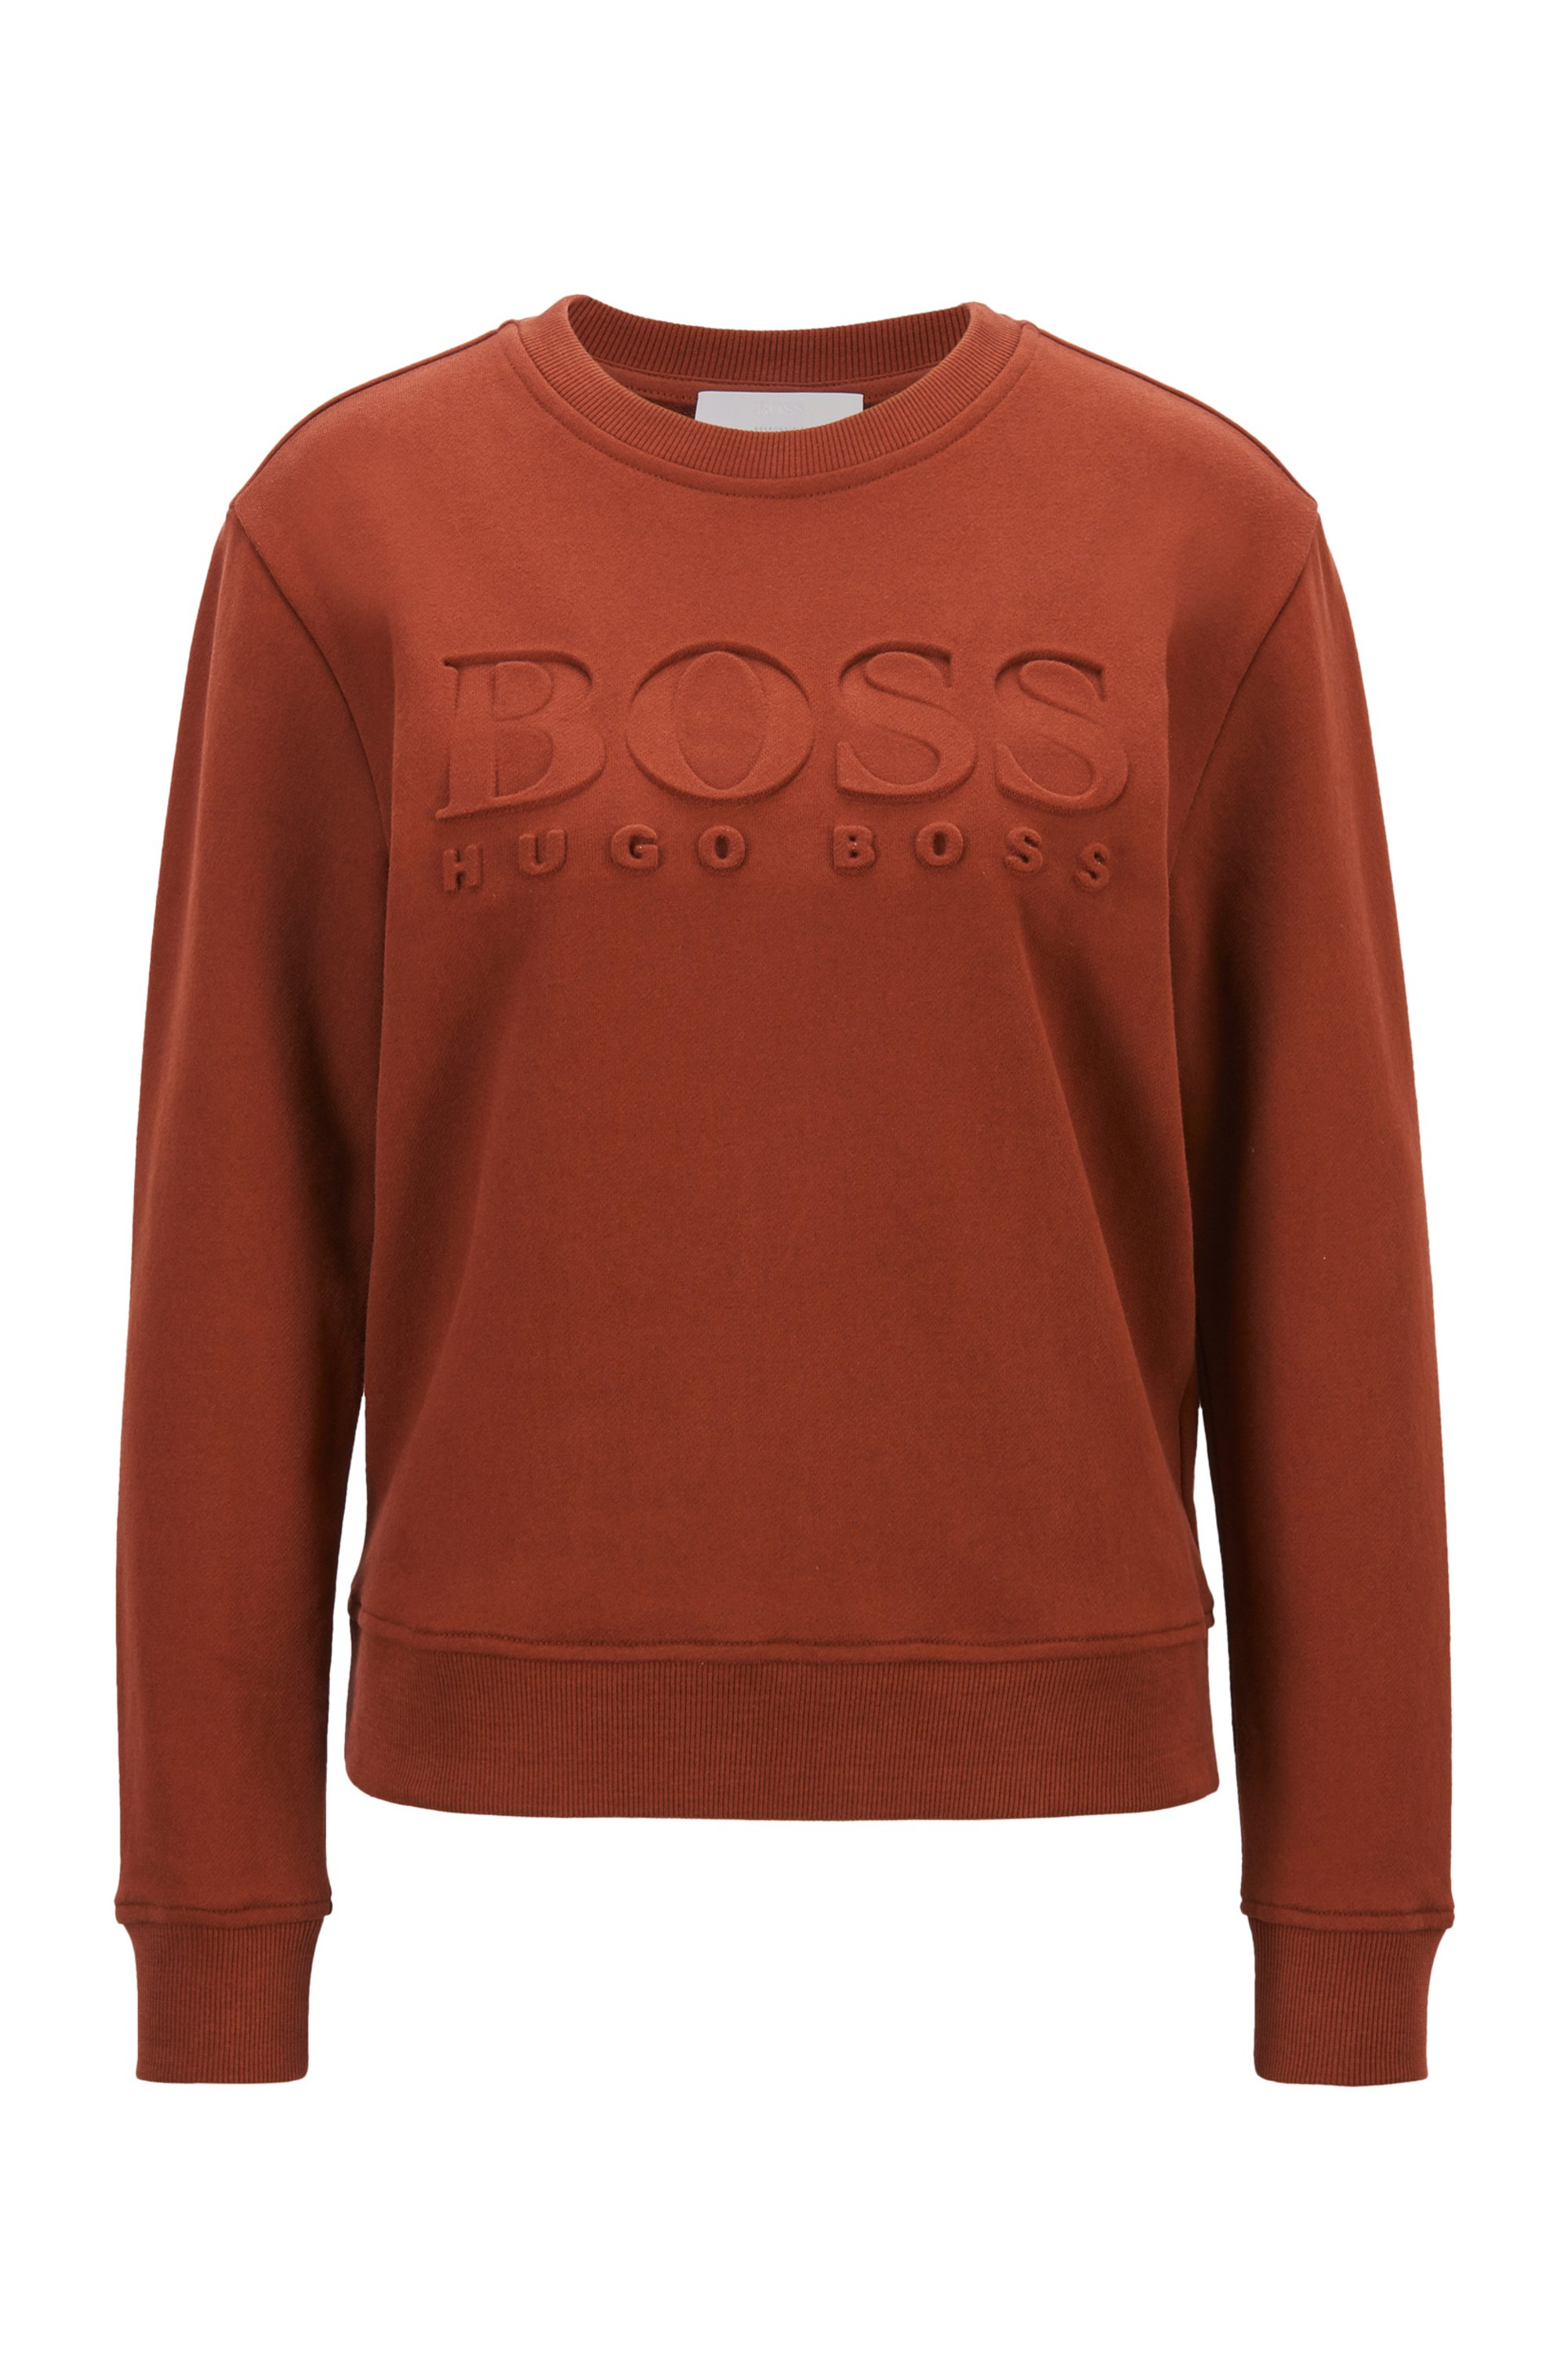 Regular-fit tonal-logo sweatshirt in organic cotton, Brown